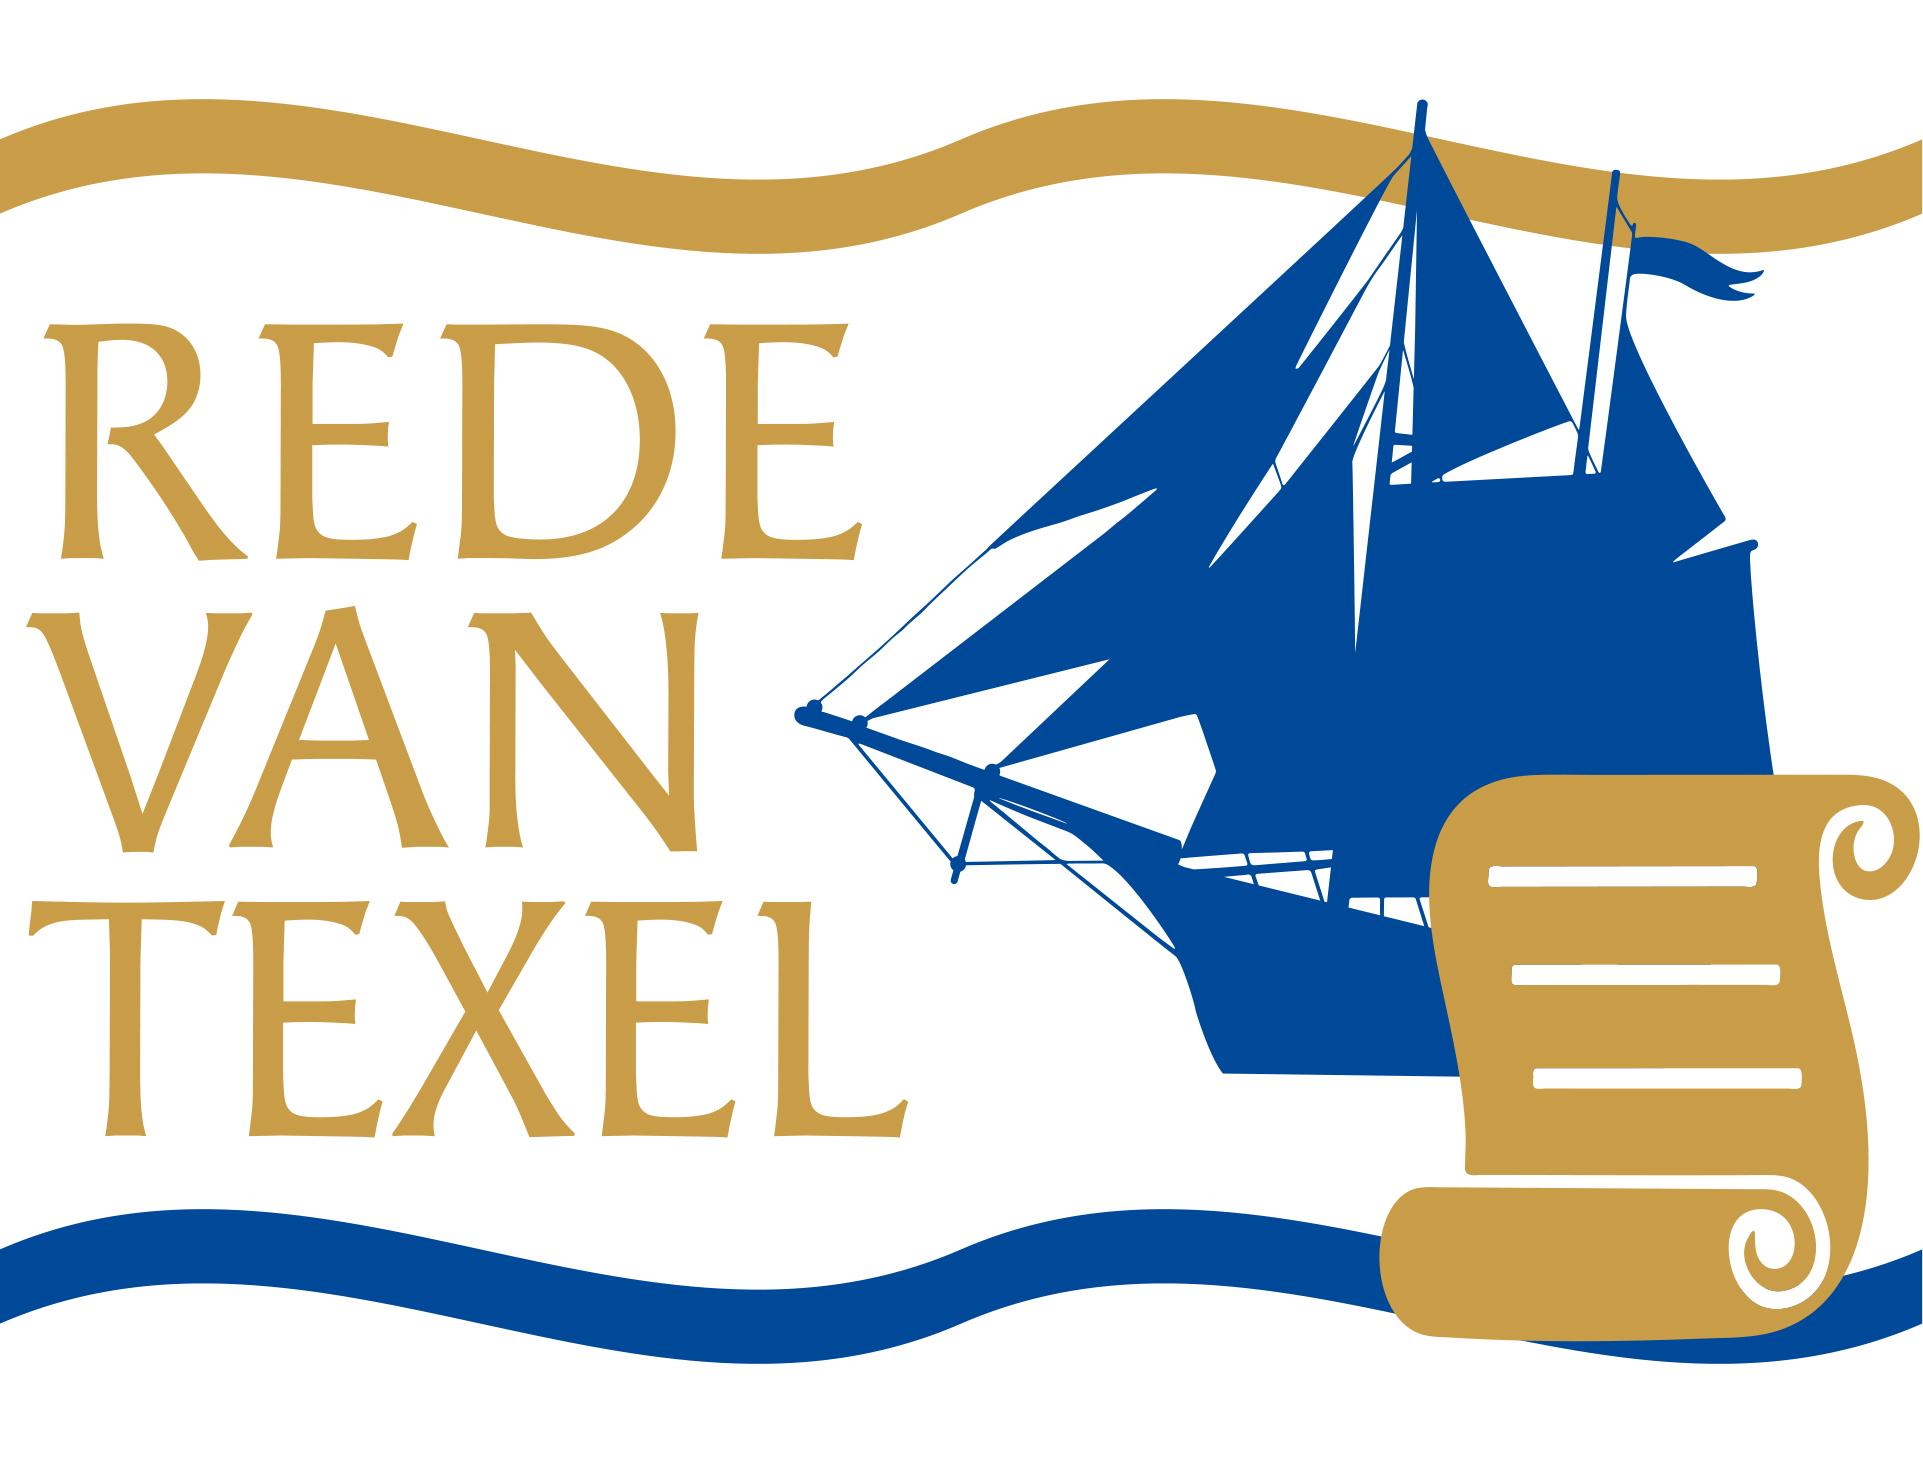 Logo Rede van Texel VVV Texel